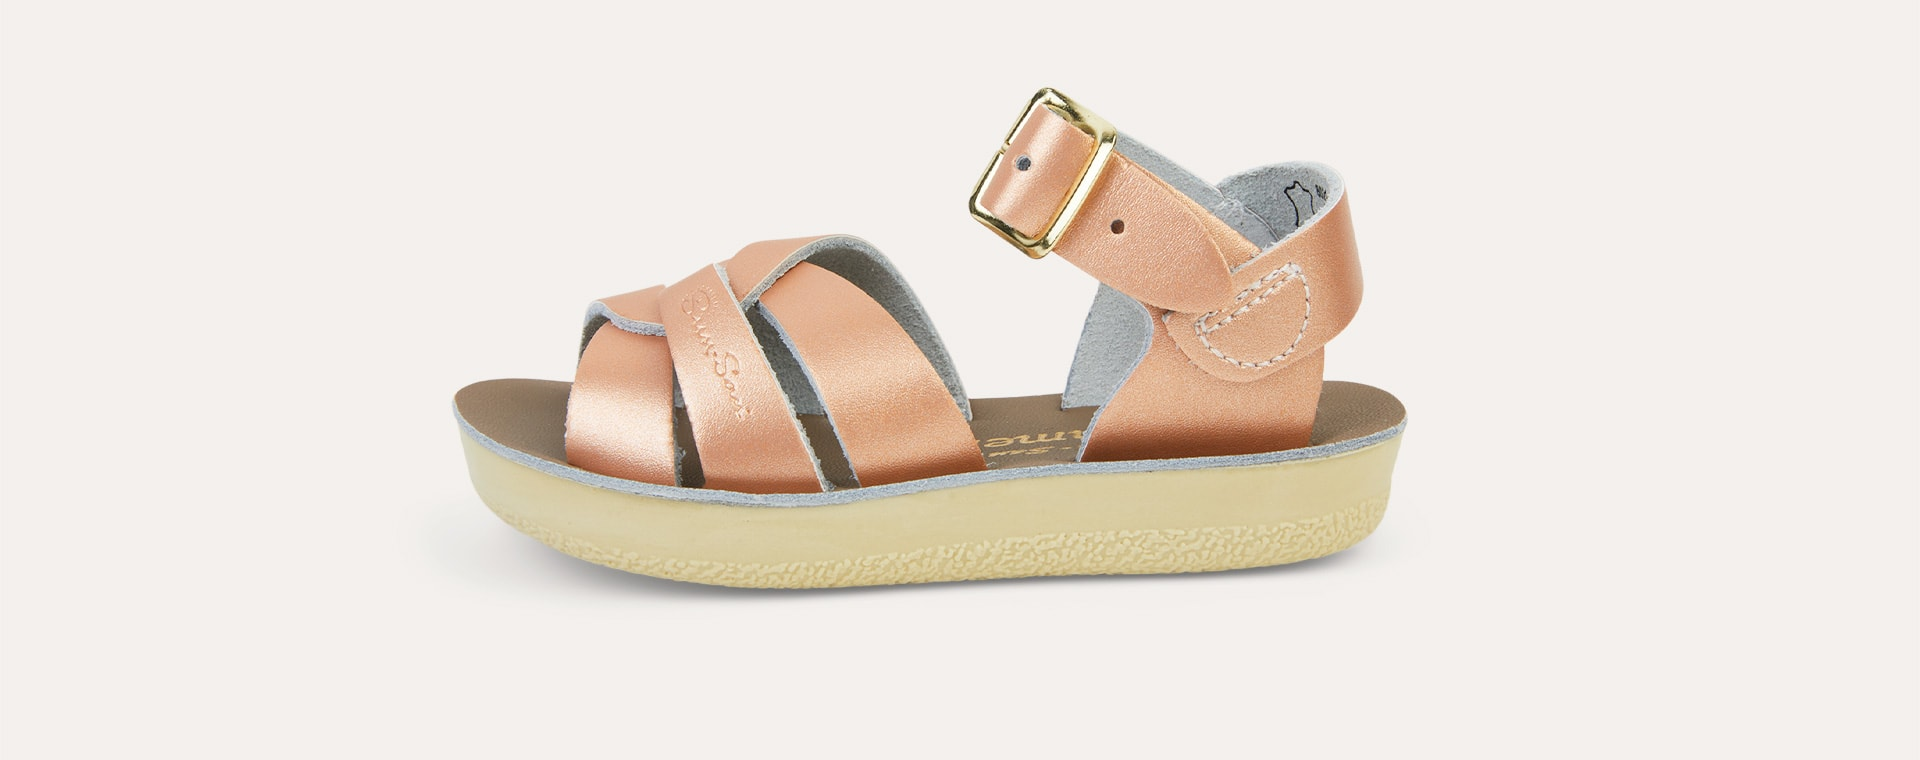 Rose Gold Salt-Water Sandals Swimmer Sandal